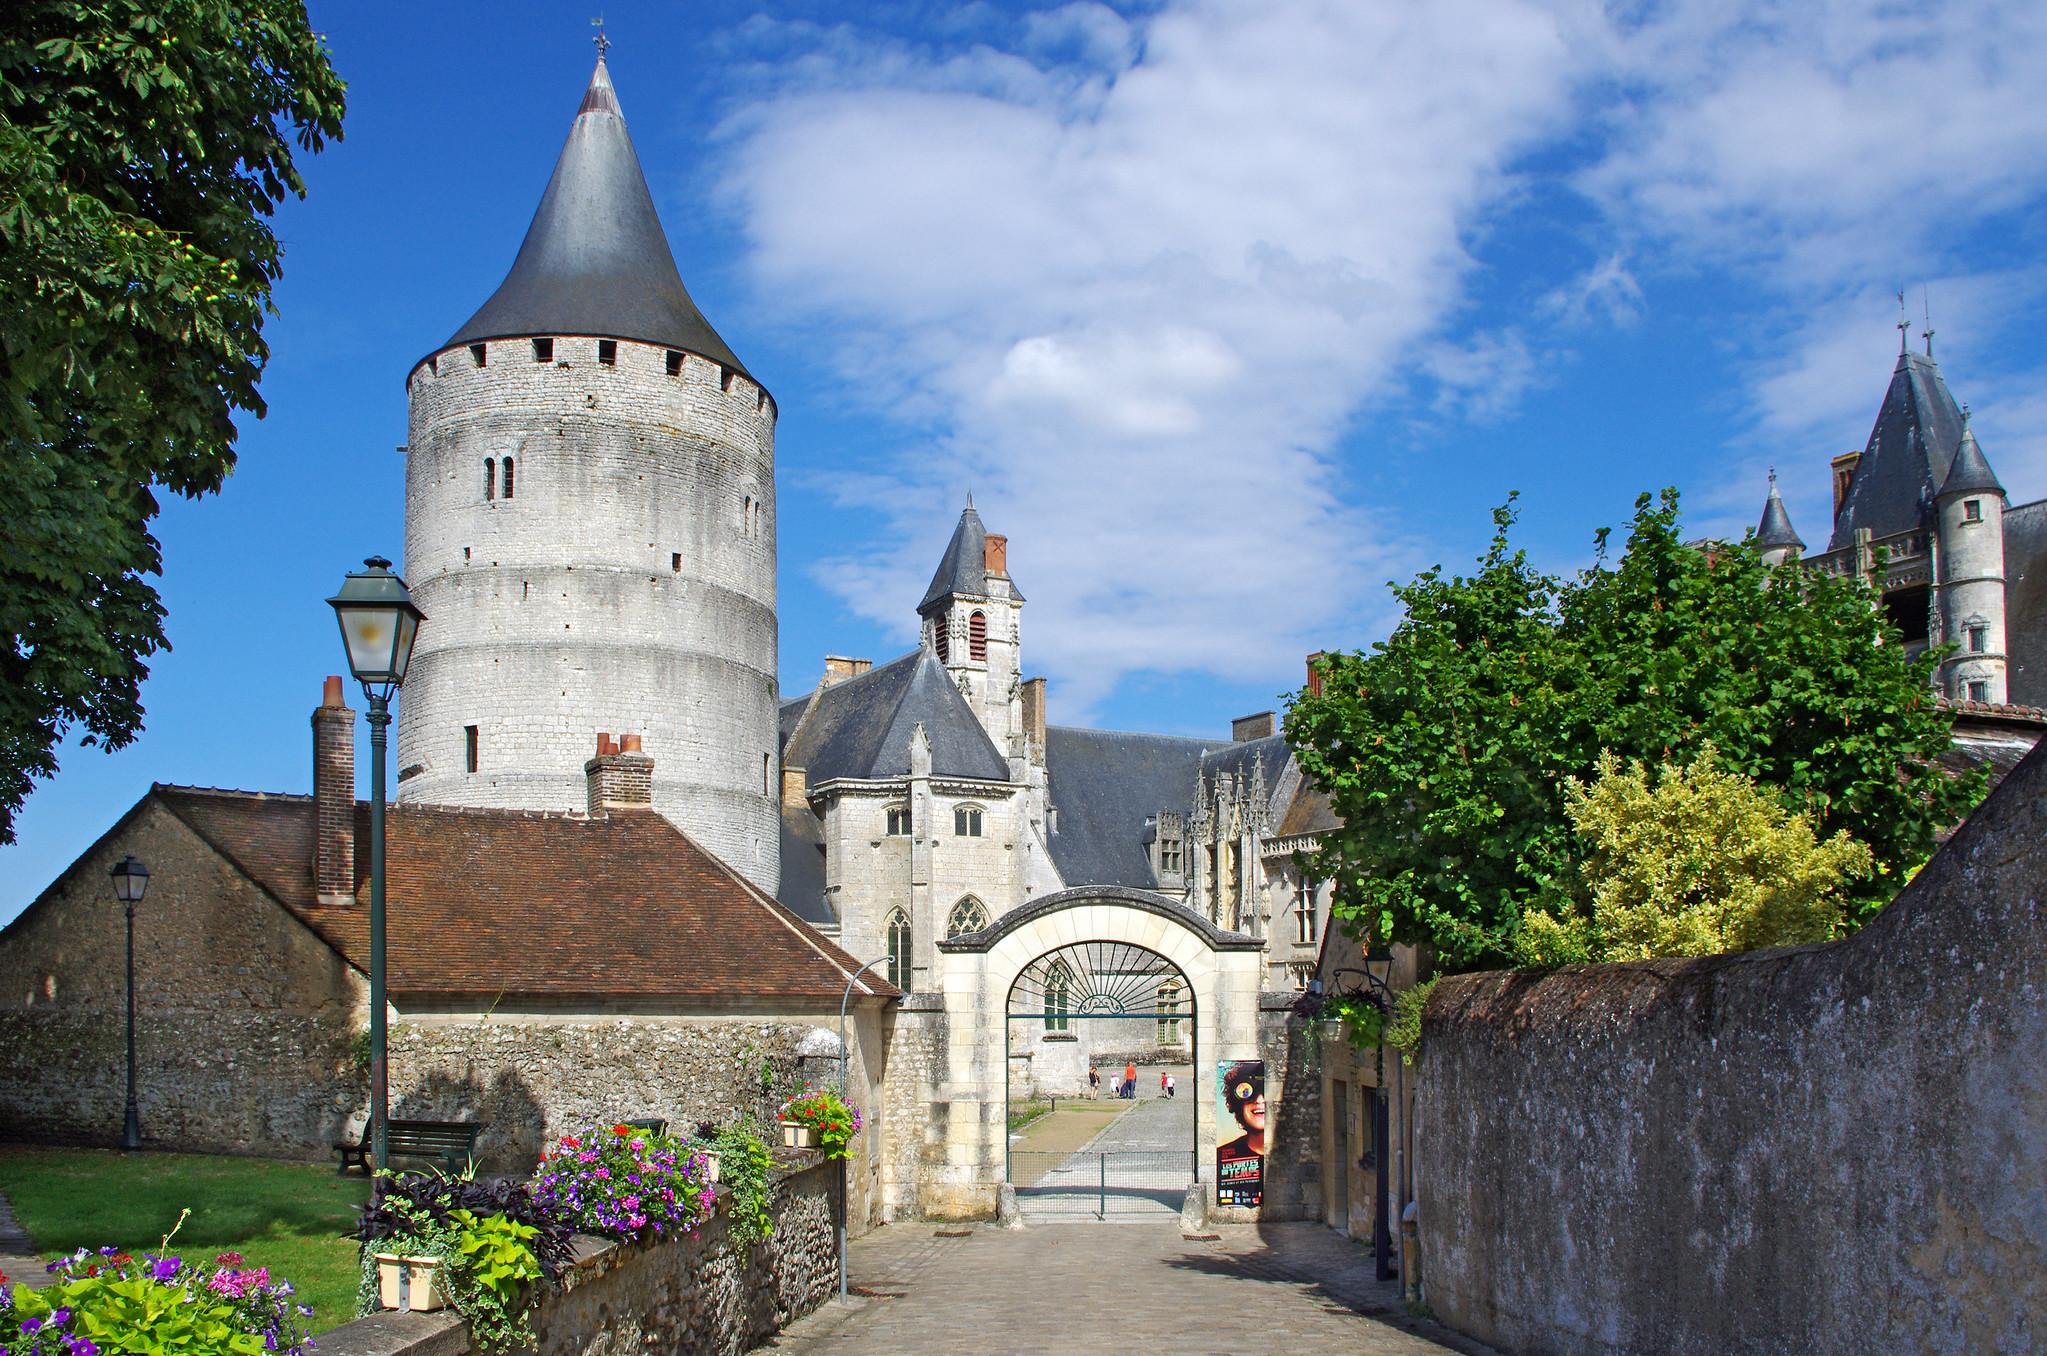 chateaudun-daniel-jolivet-14841513971_836d35b1cd_k